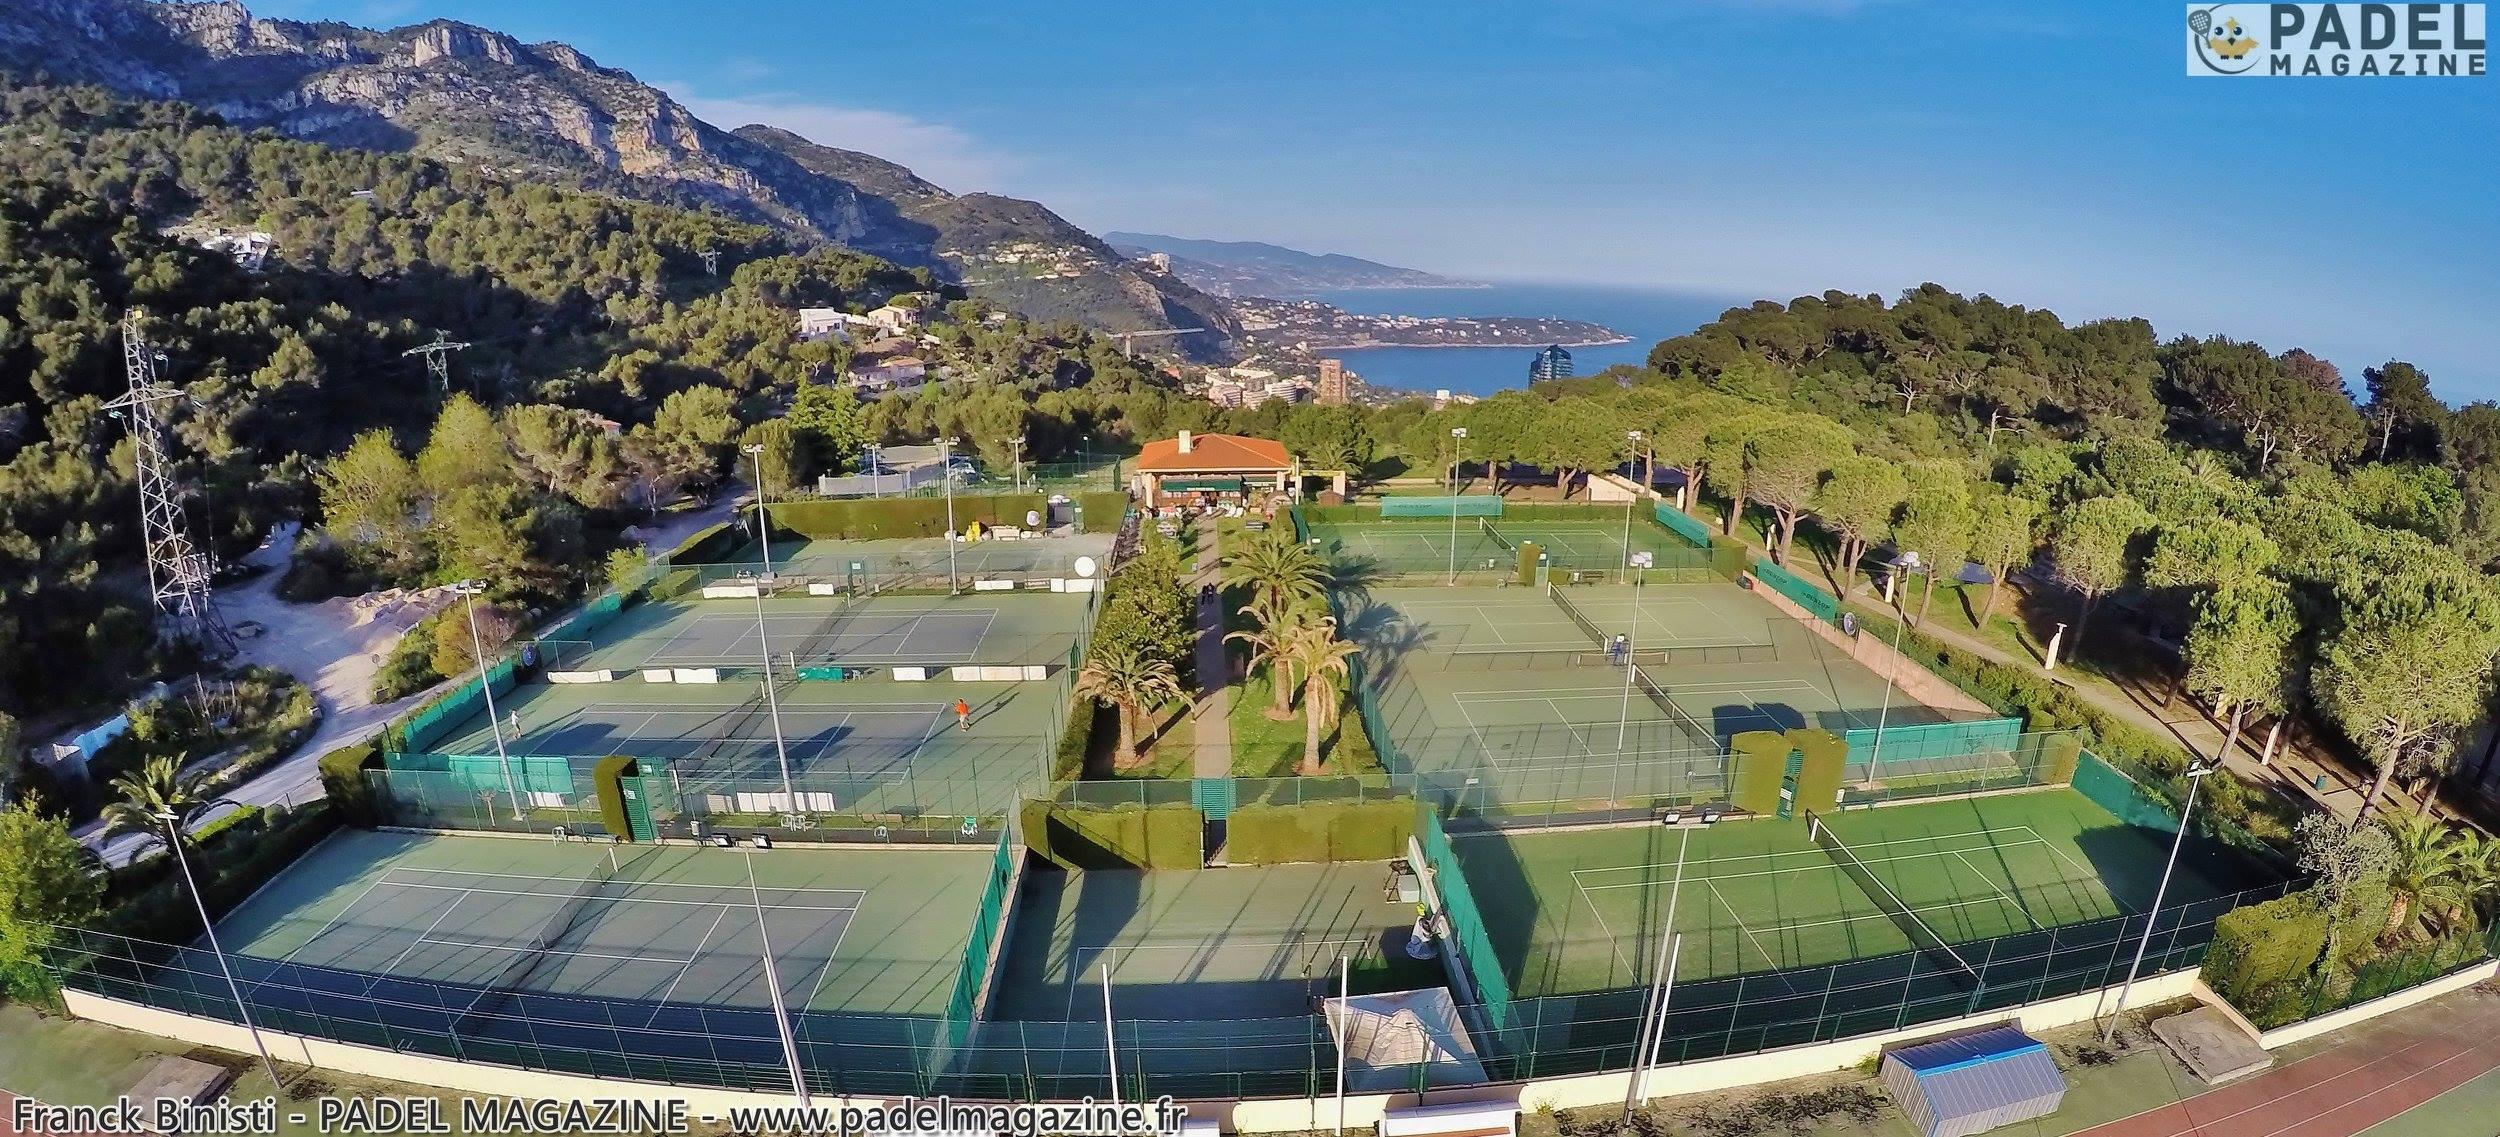 tennis-padel-soleil-monaco